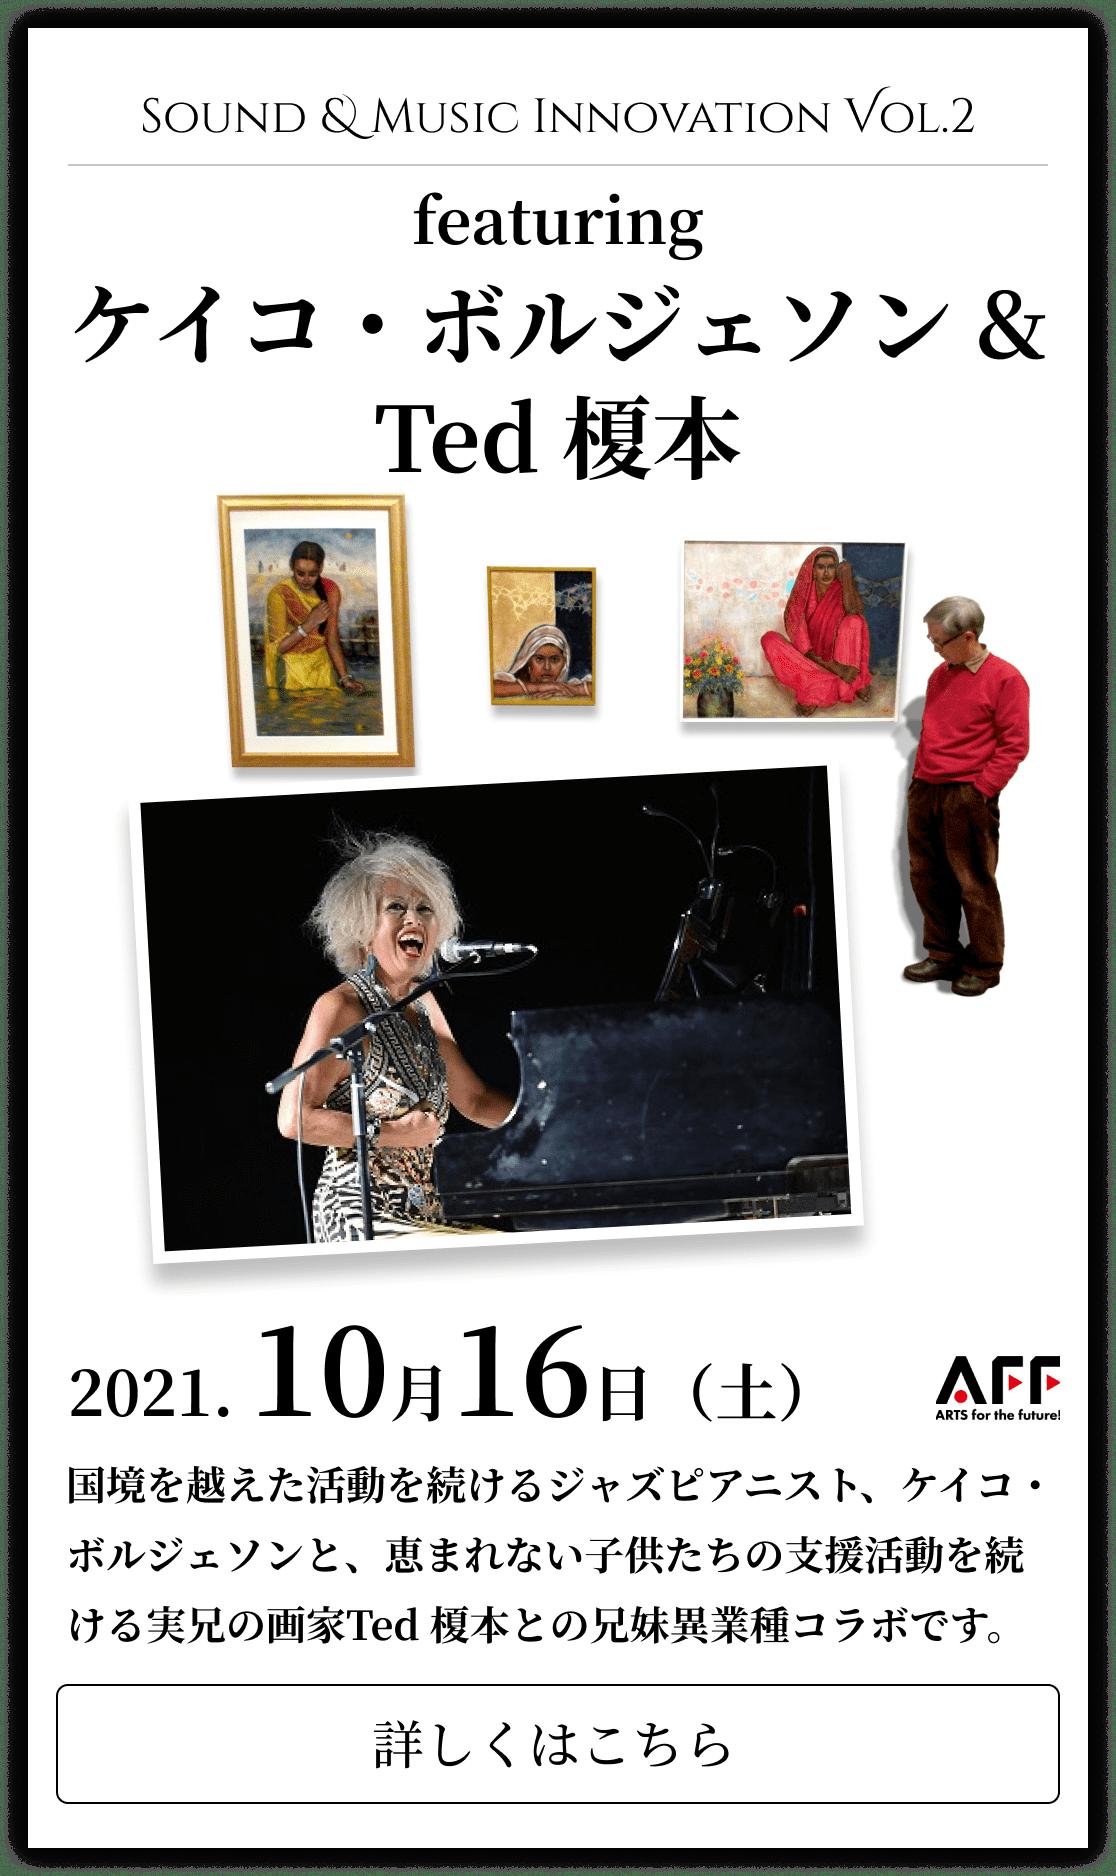 featuring ケイコ・ボルジェソン & Ted 榎本